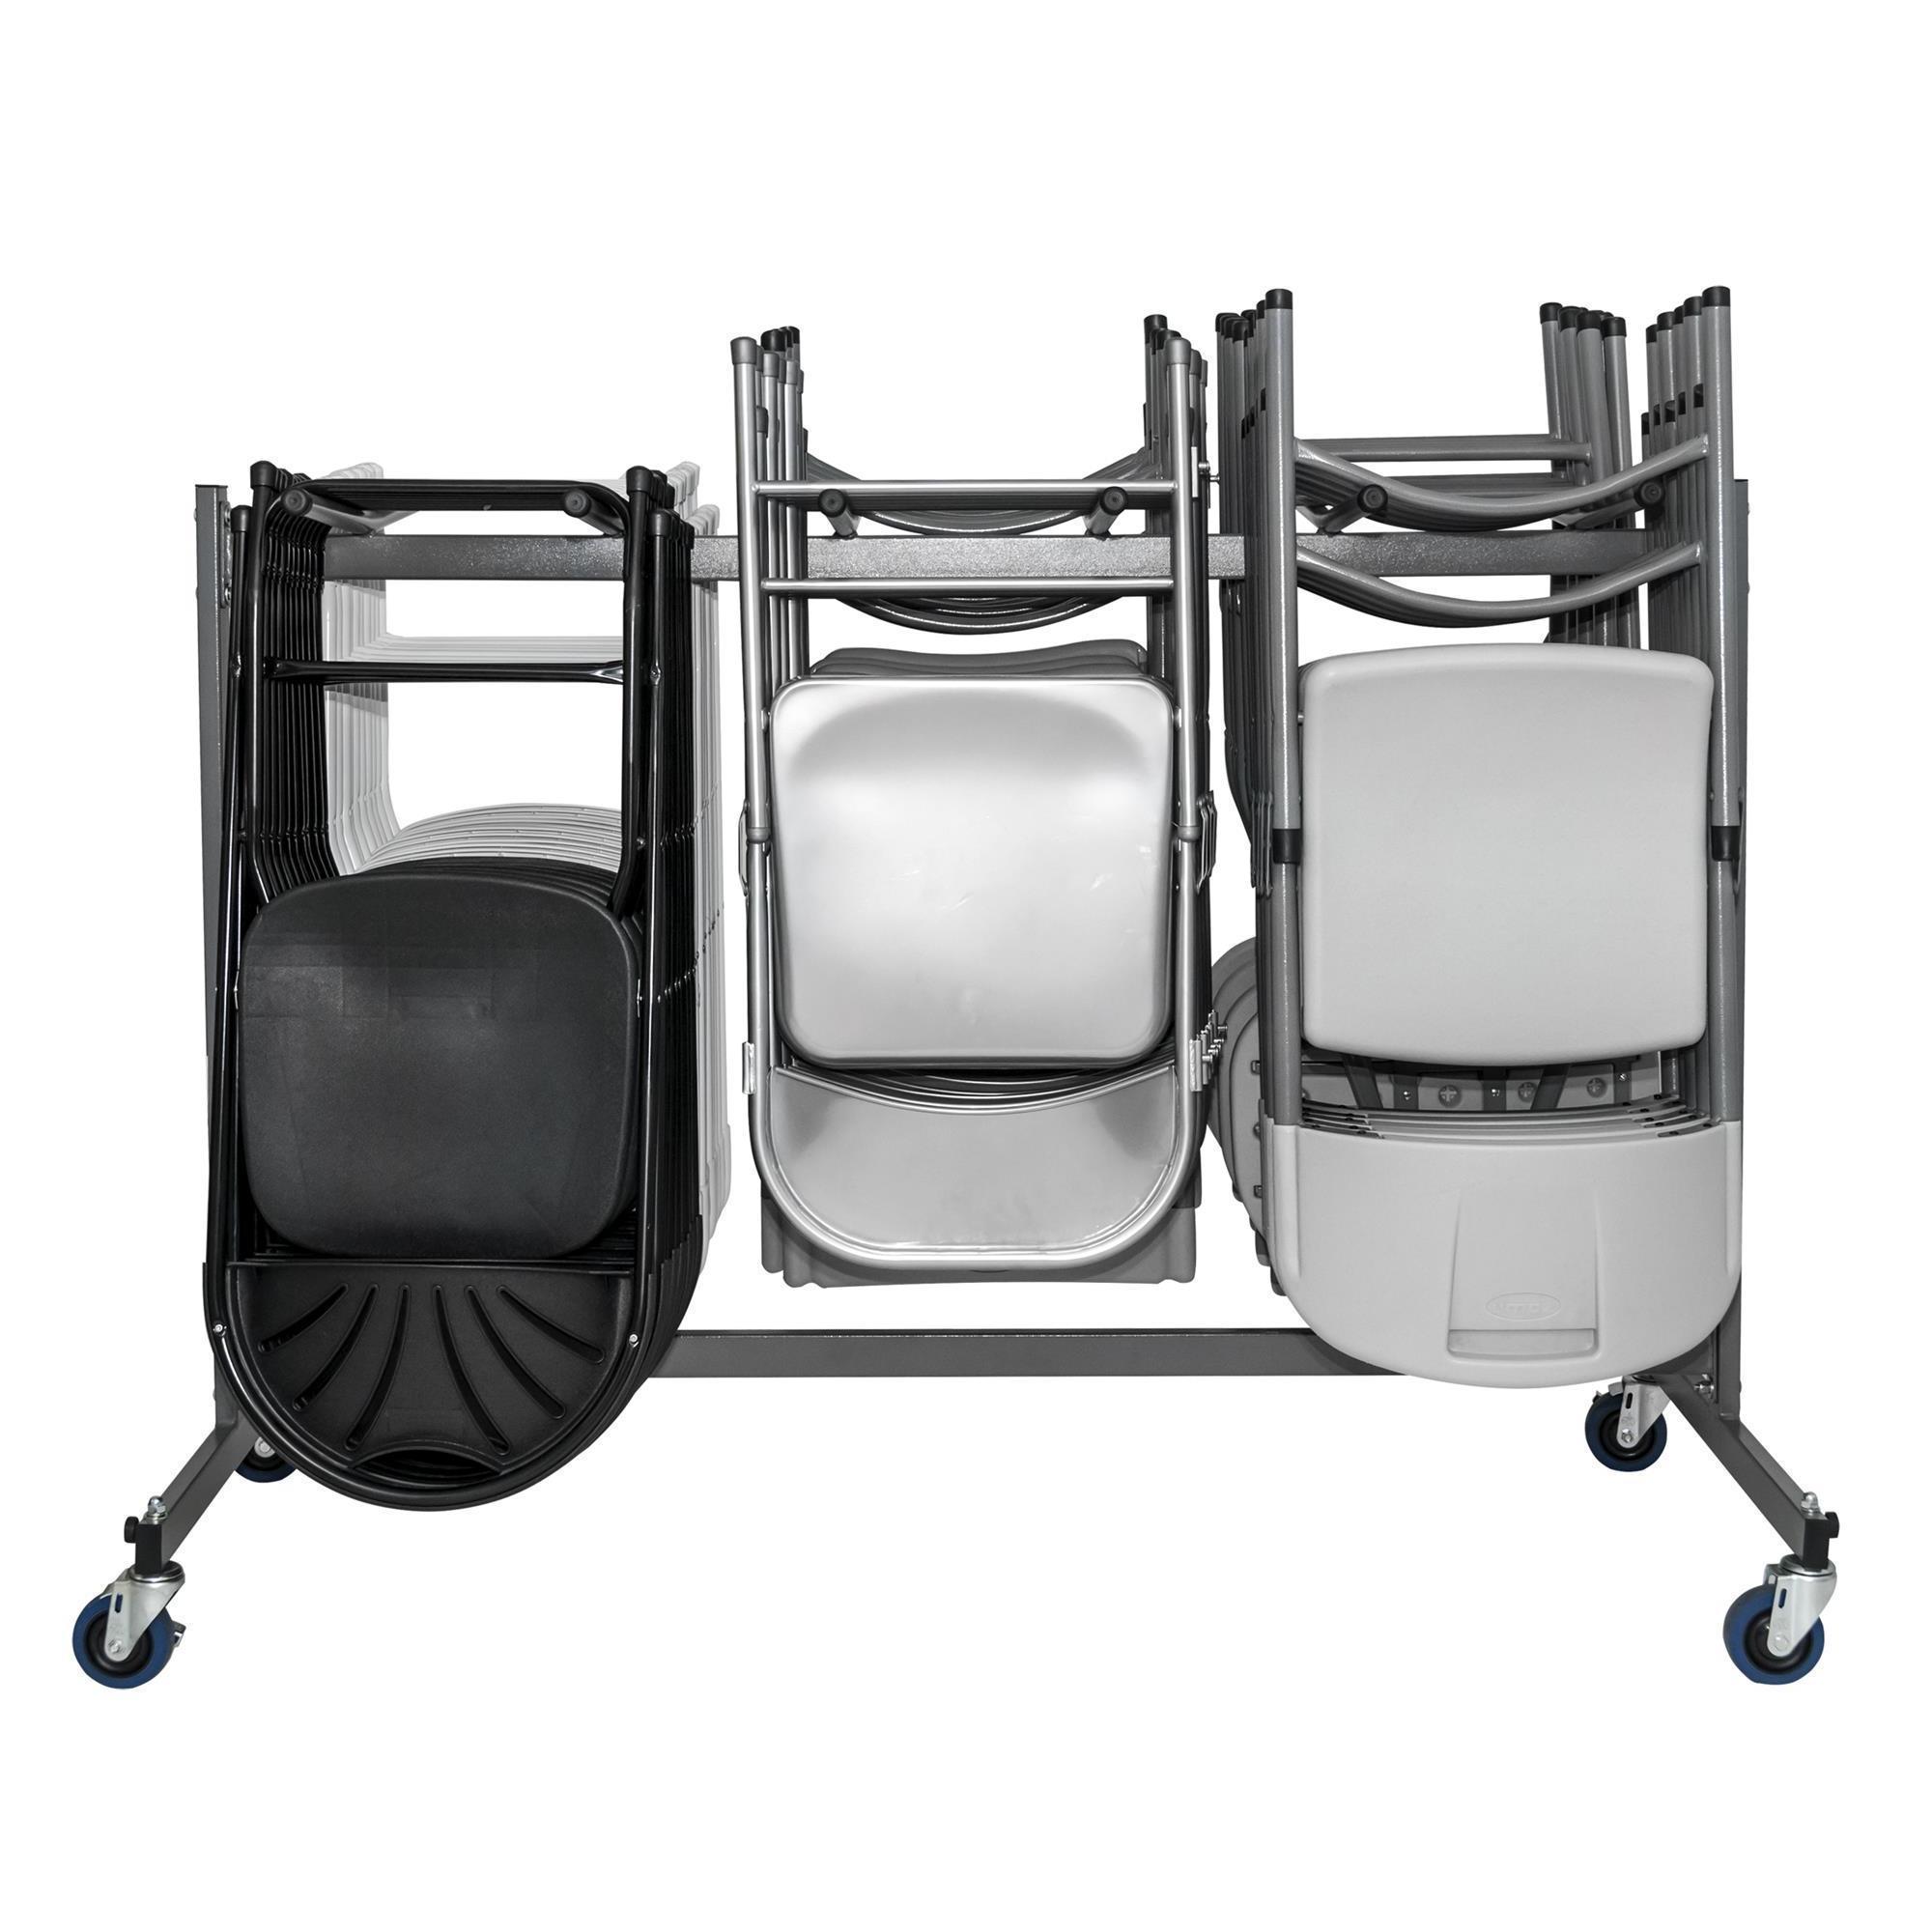 COSCO mercial Heavy Duty Grey Folding Chair Trolley Cart with